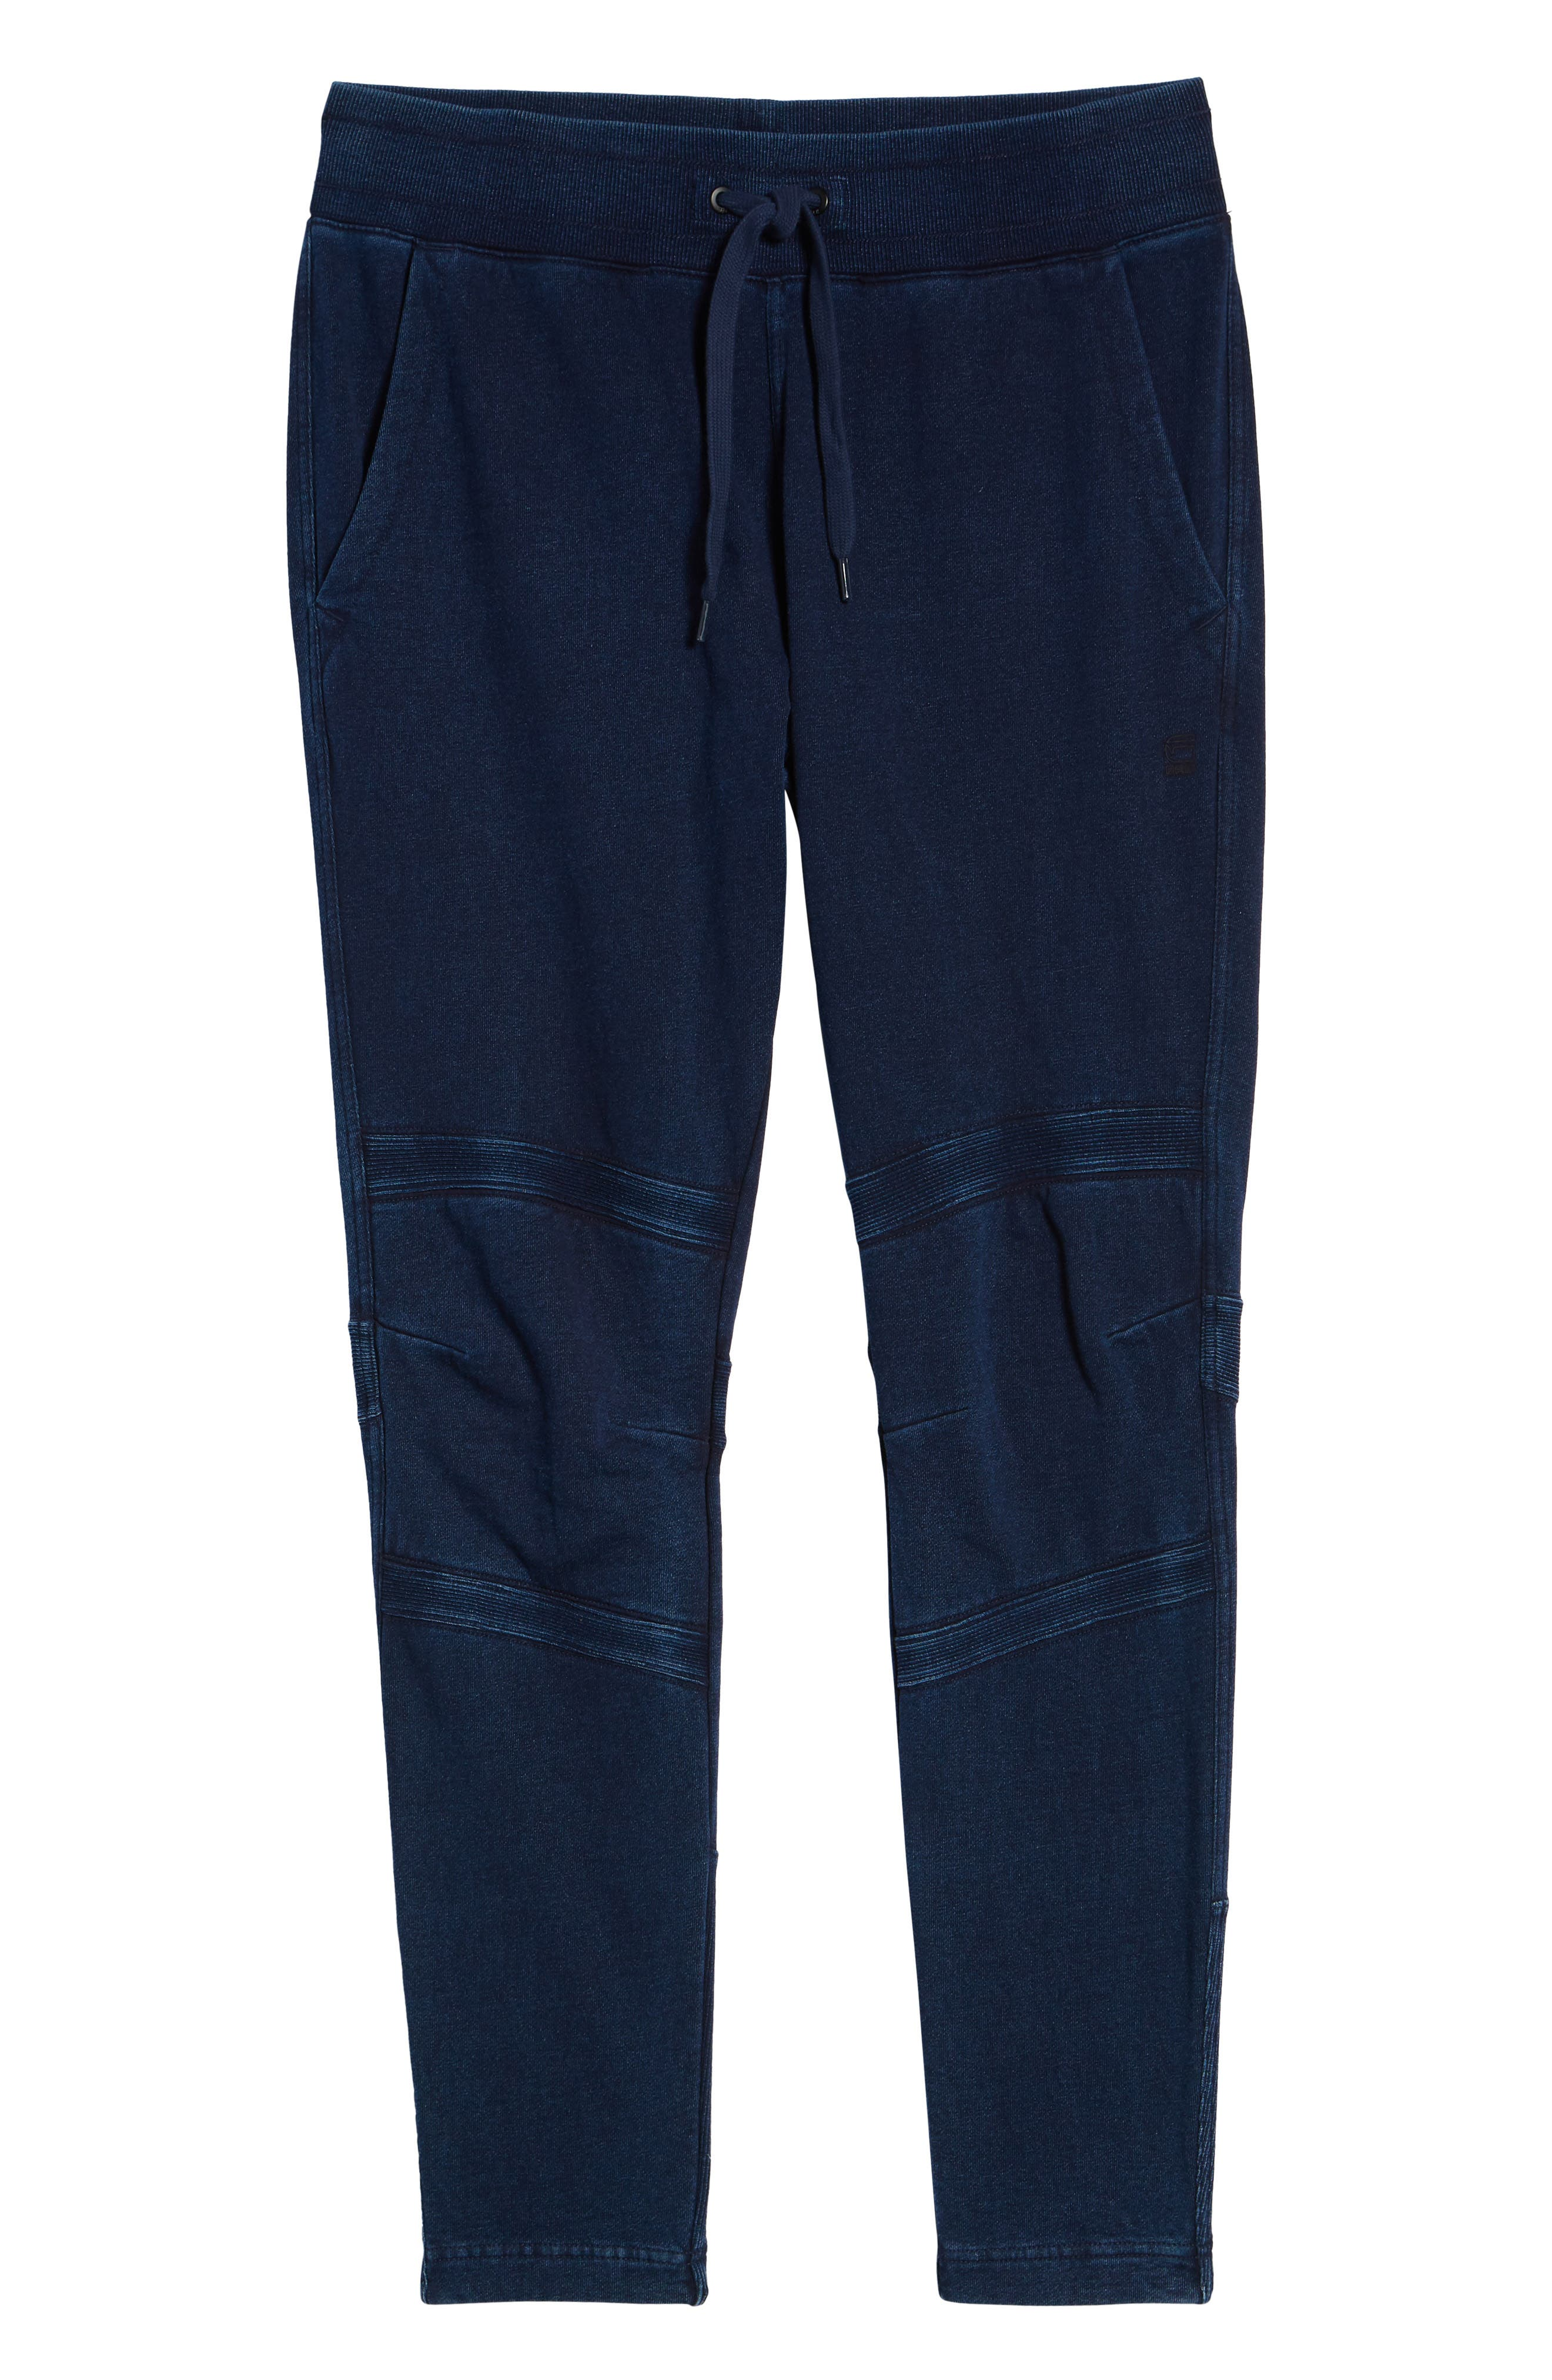 G-STAR RAW,                             Motac-X Slim Fit Sweat Pants,                             Alternate thumbnail 6, color,                             001